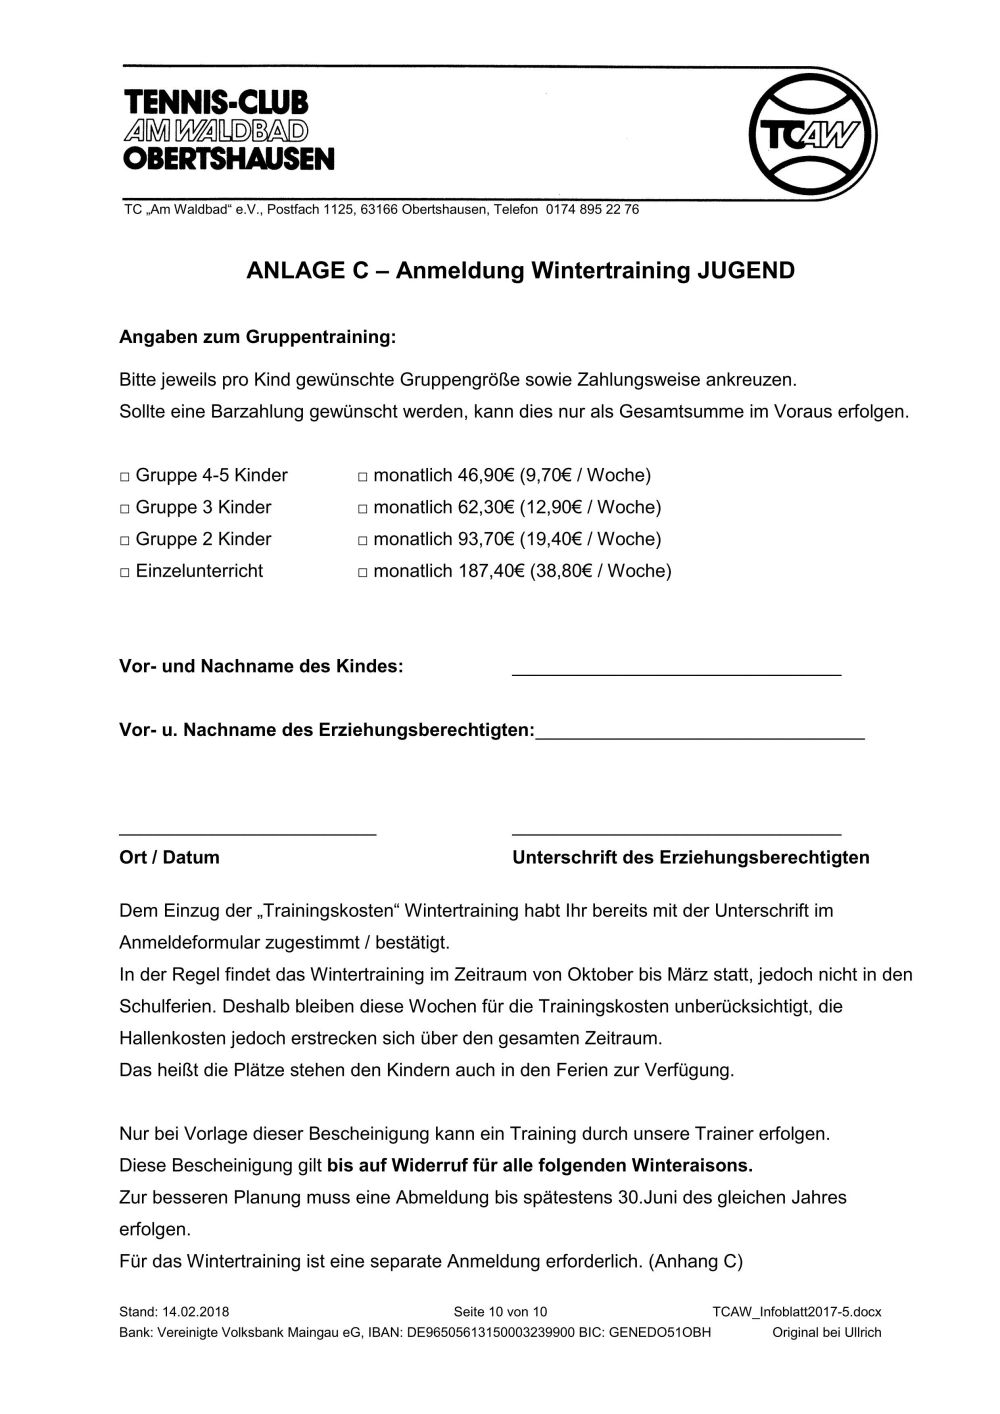 Großartig Anmeldeformular Vorlagen Bilder - Entry Level Resume ...